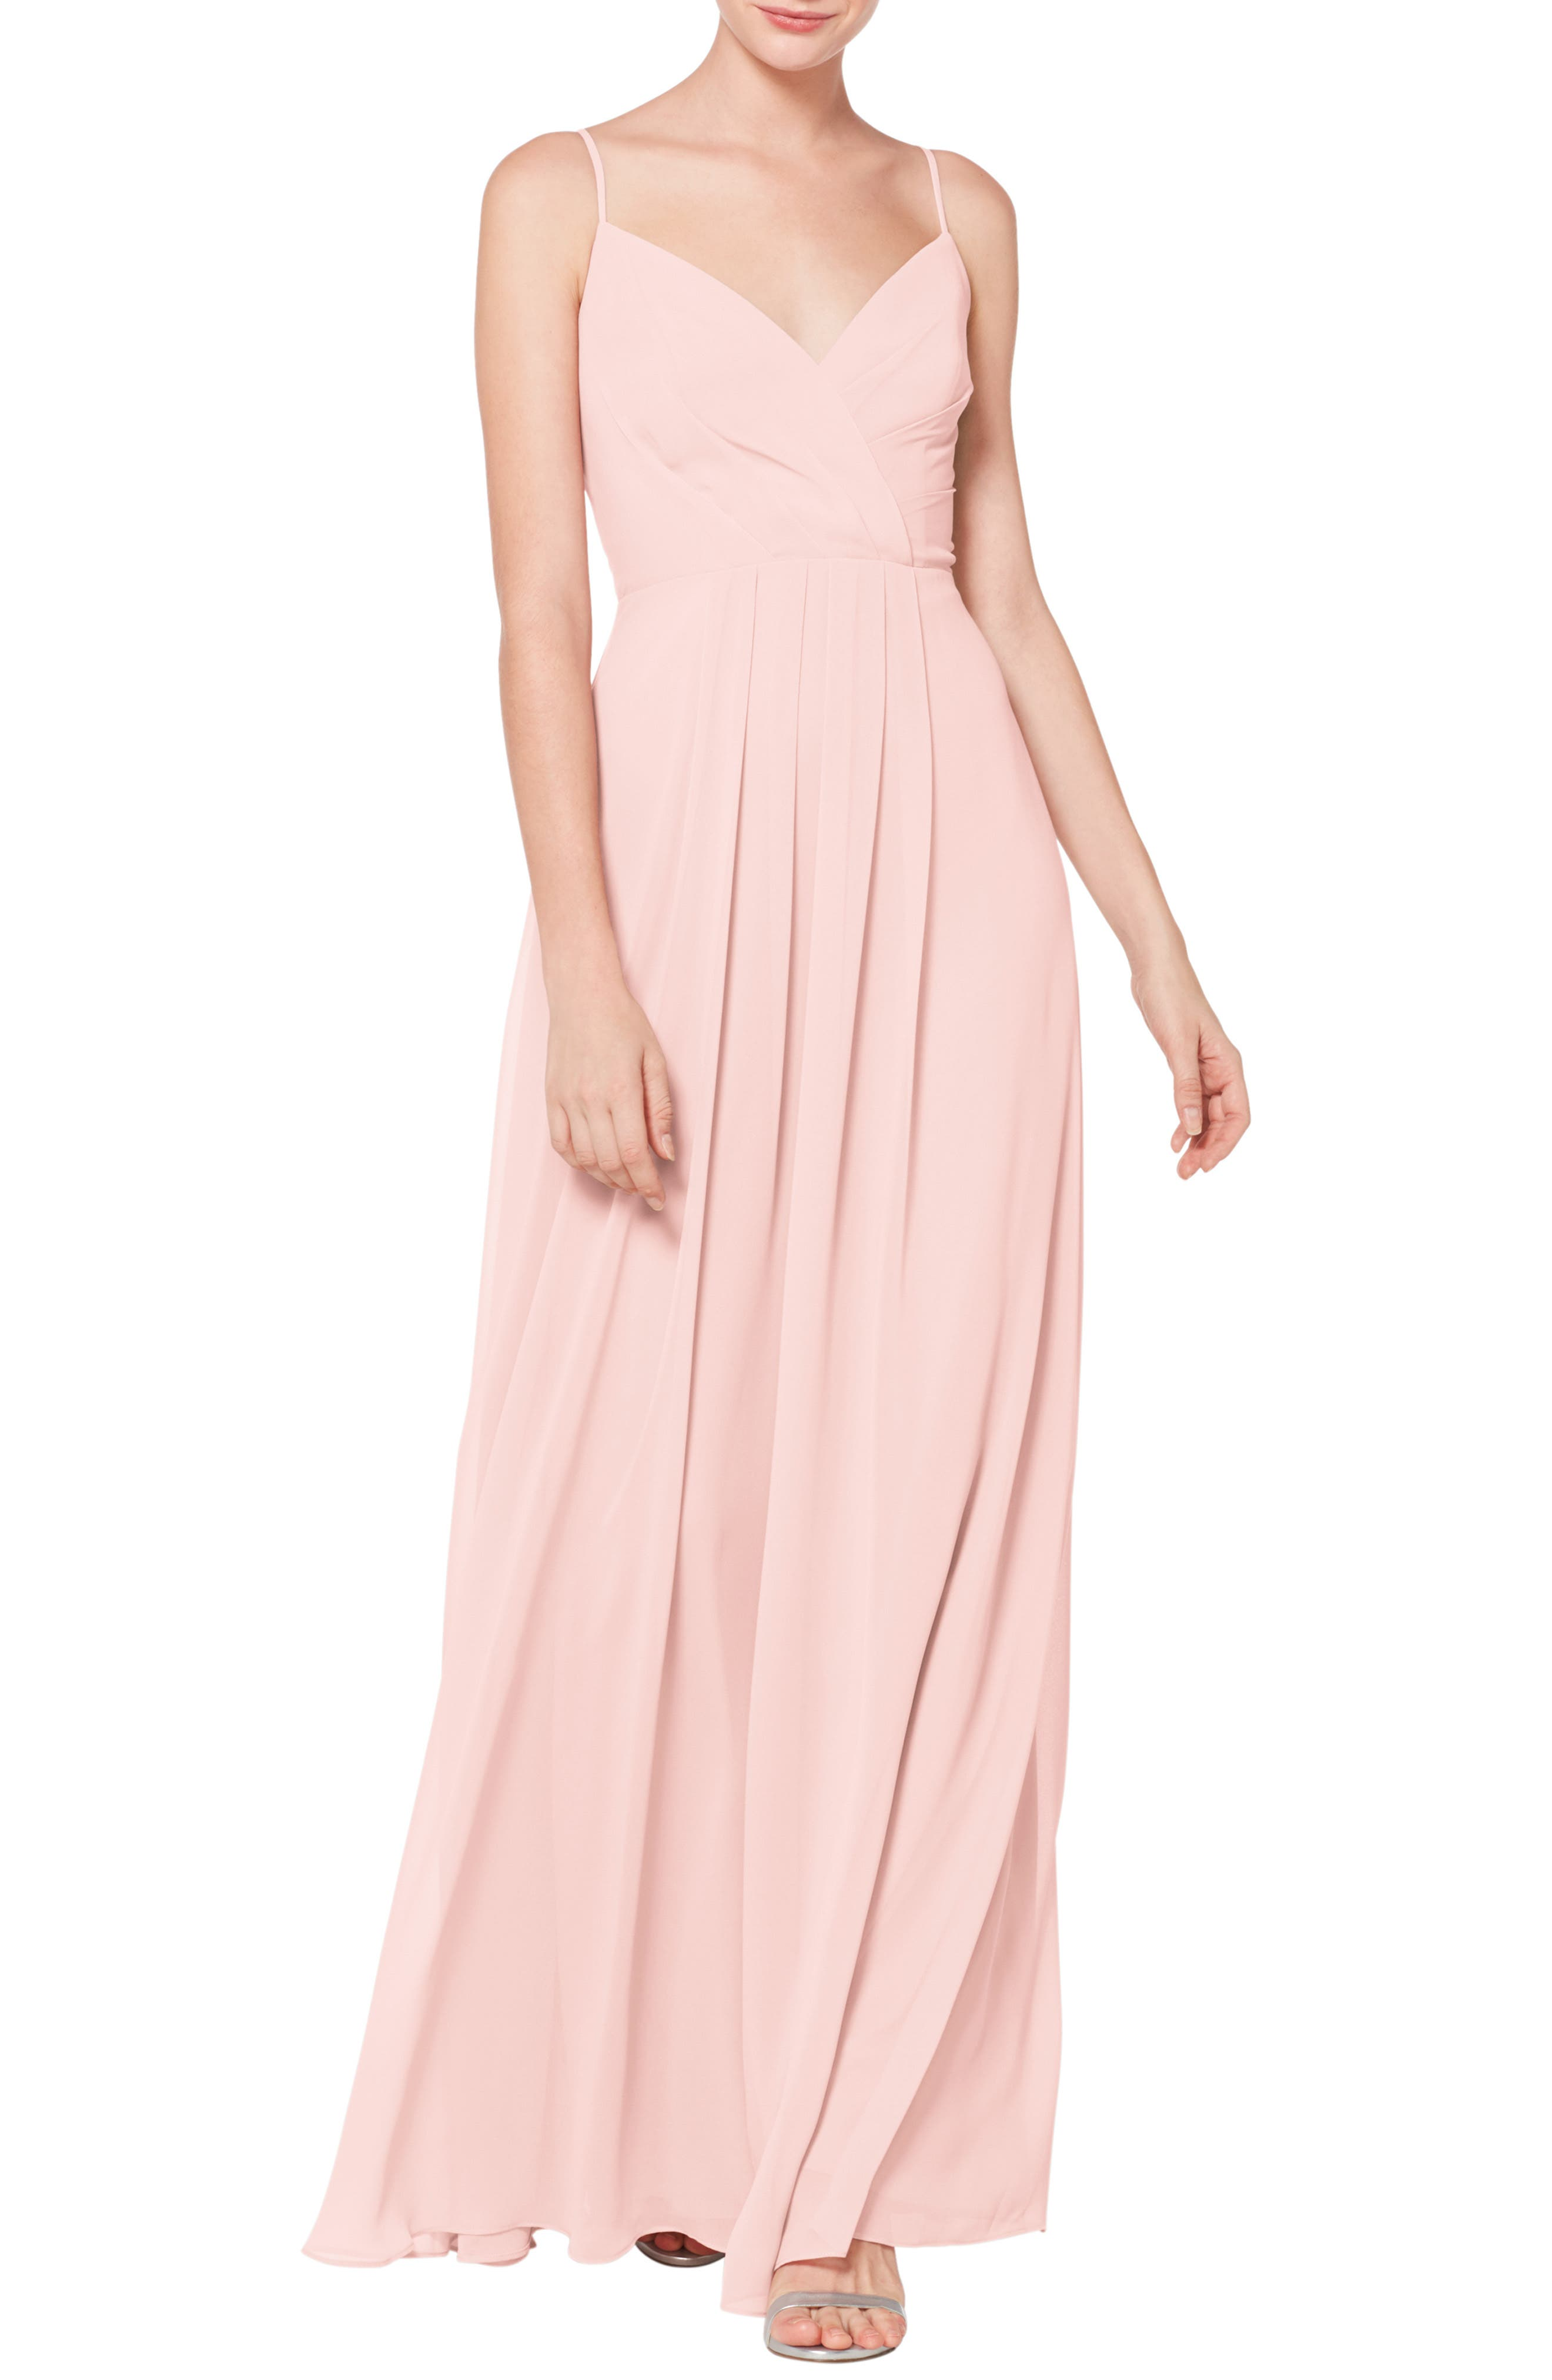 #levkoff Surplice Neck Chiffon Evening Dress, Pink